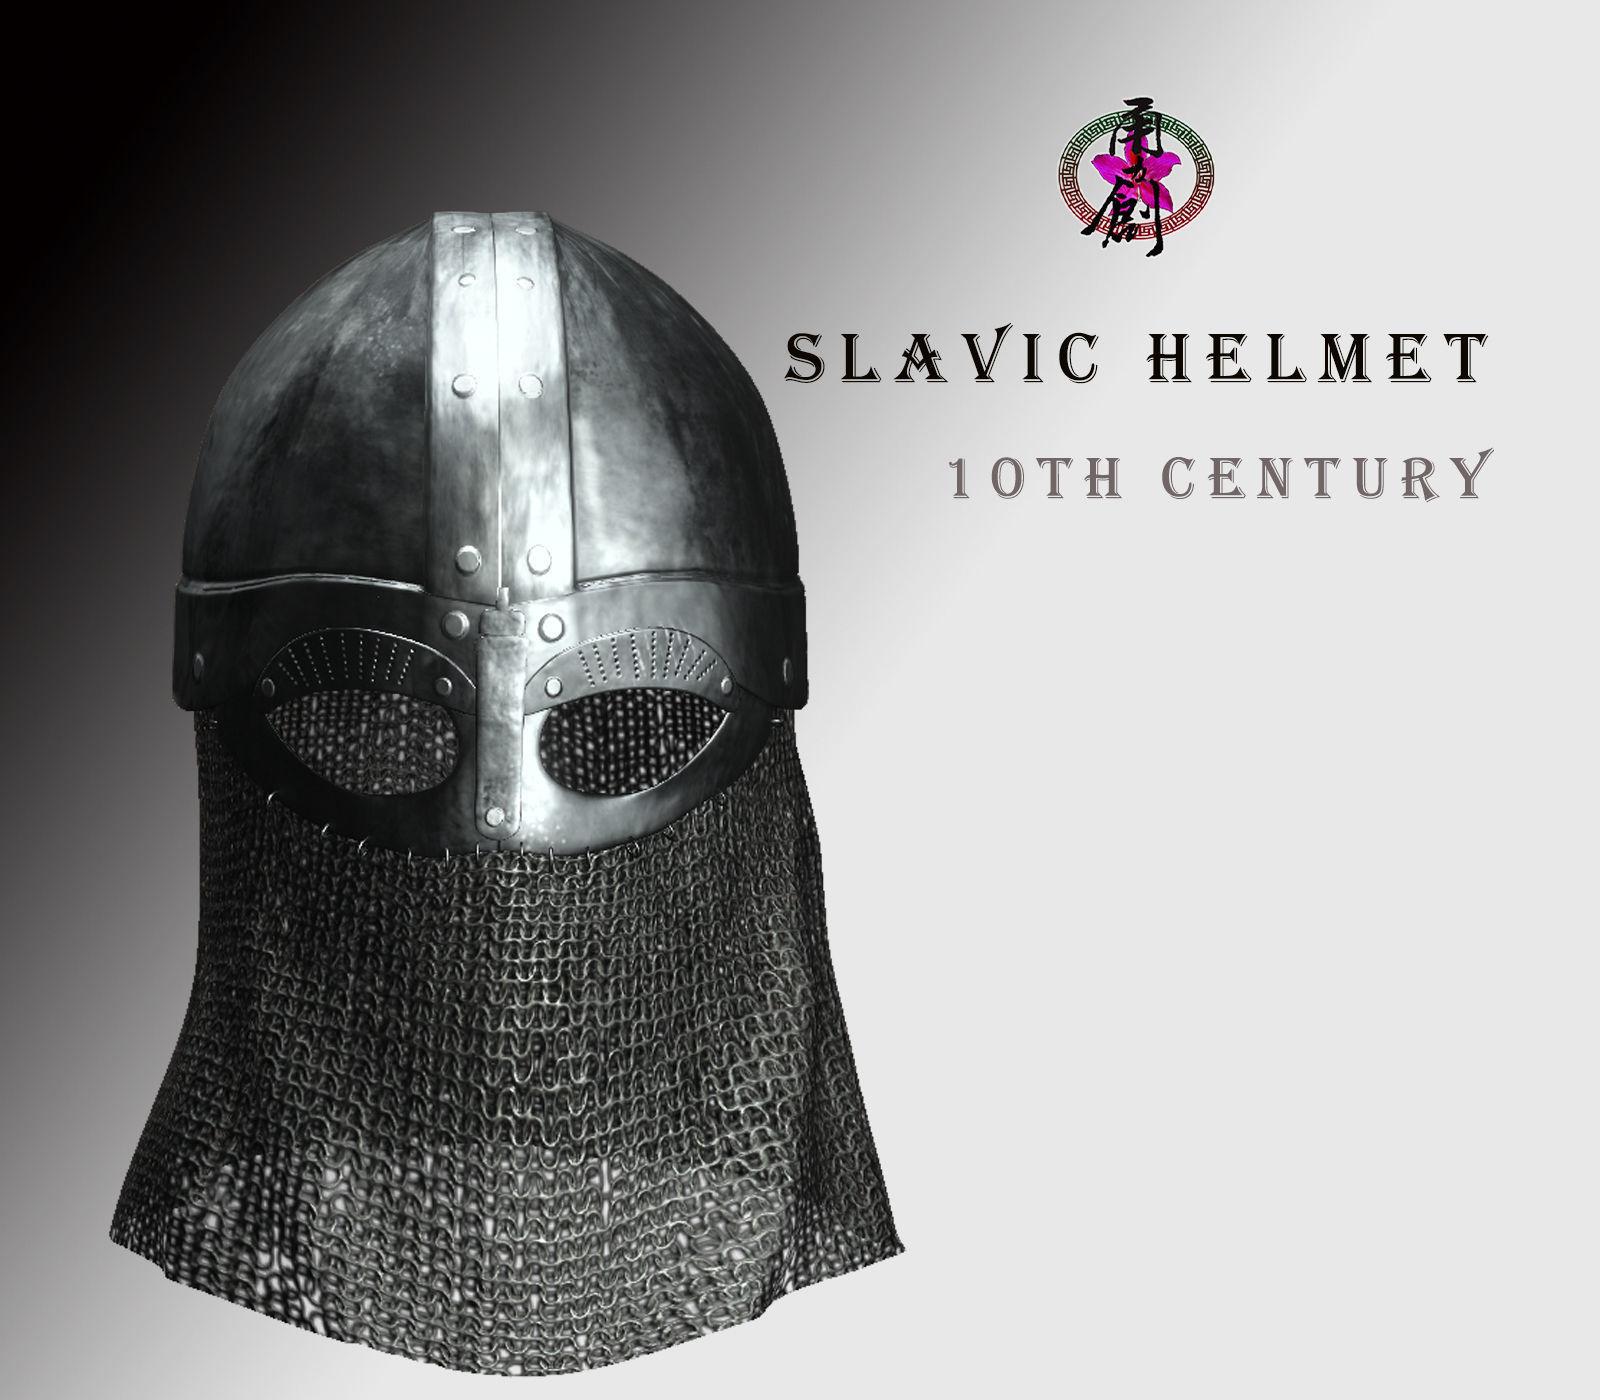 Slavic Helmet - 10th Century